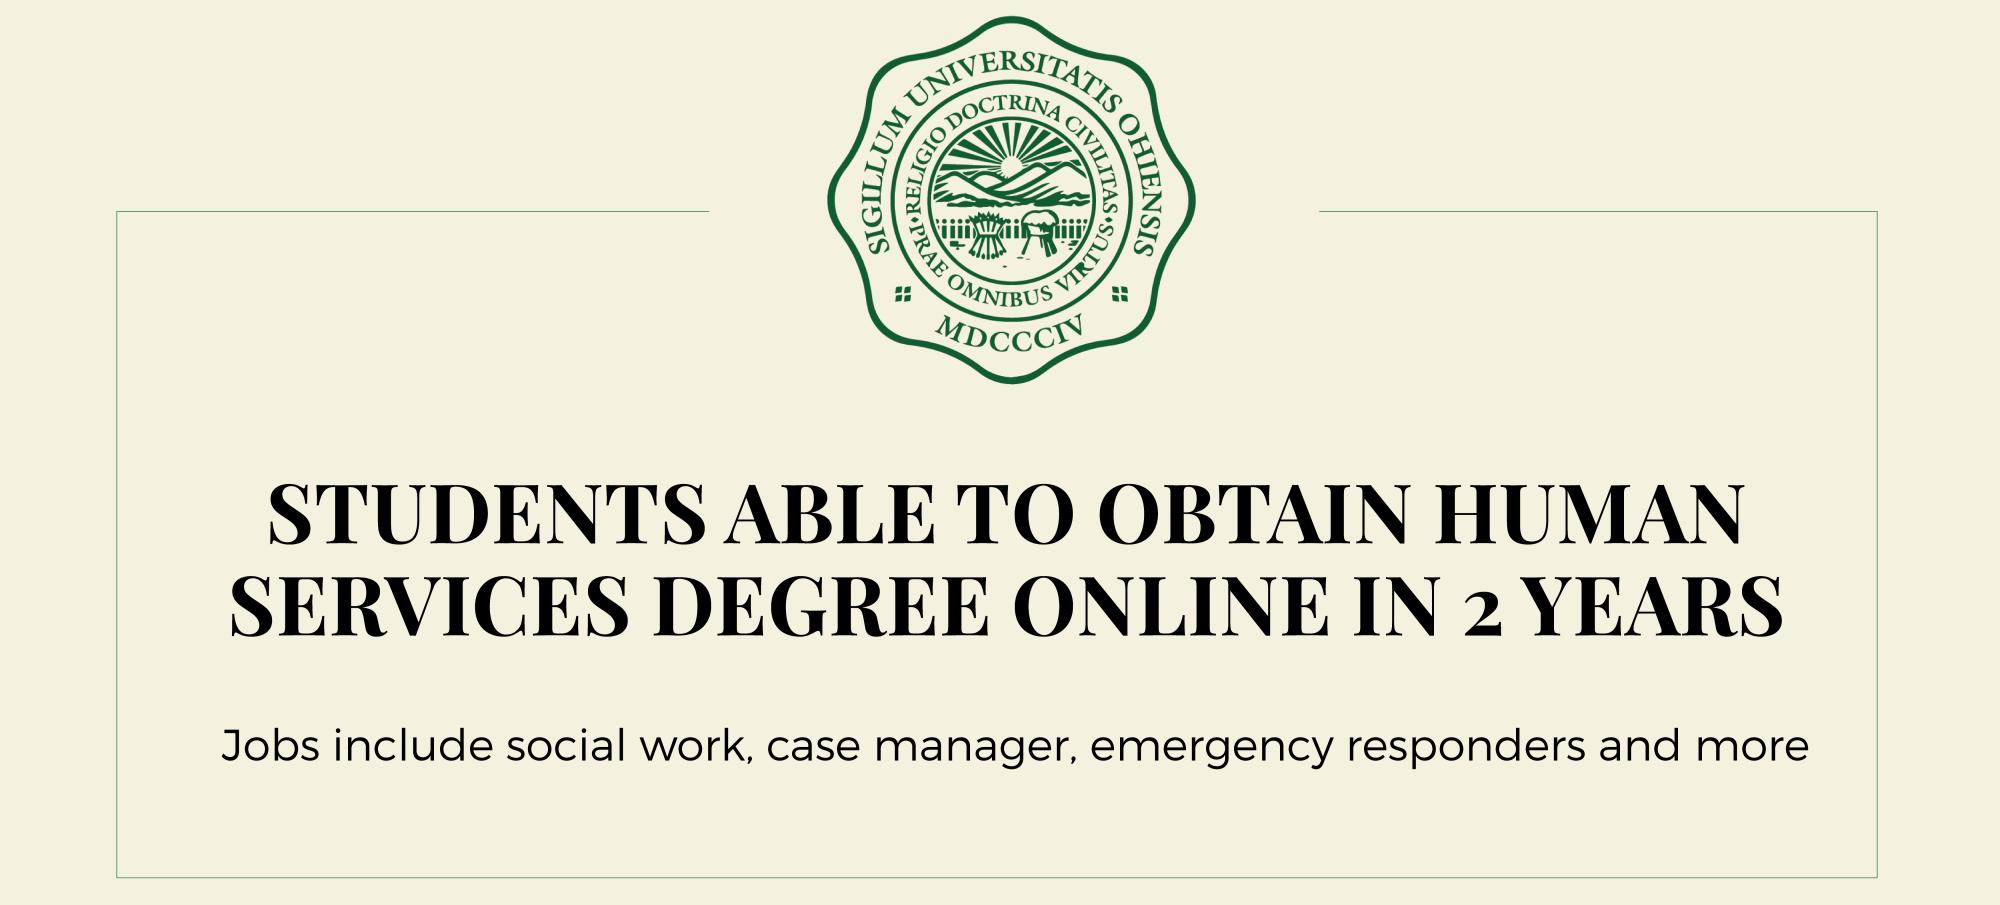 Illustration of a degree